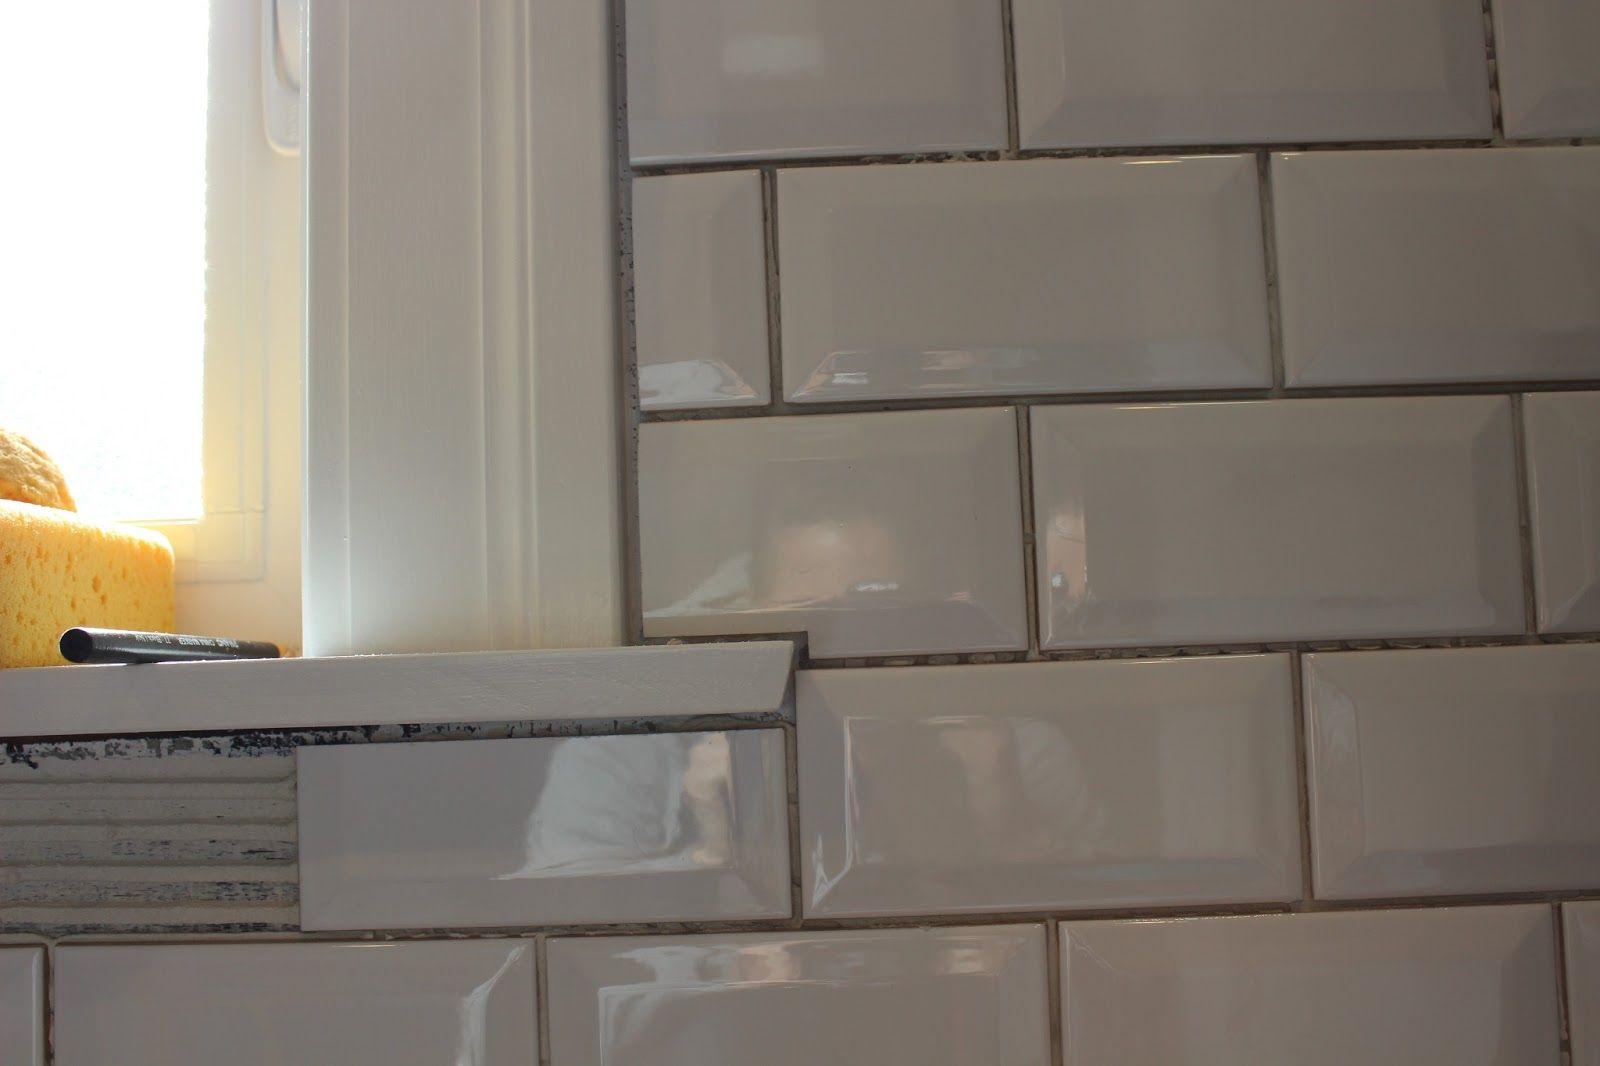 Img 0594 Jpg 1 600 1 066 Pixels Contemporary Remodel Tile Around Window Kitchen Tiles Backsplash